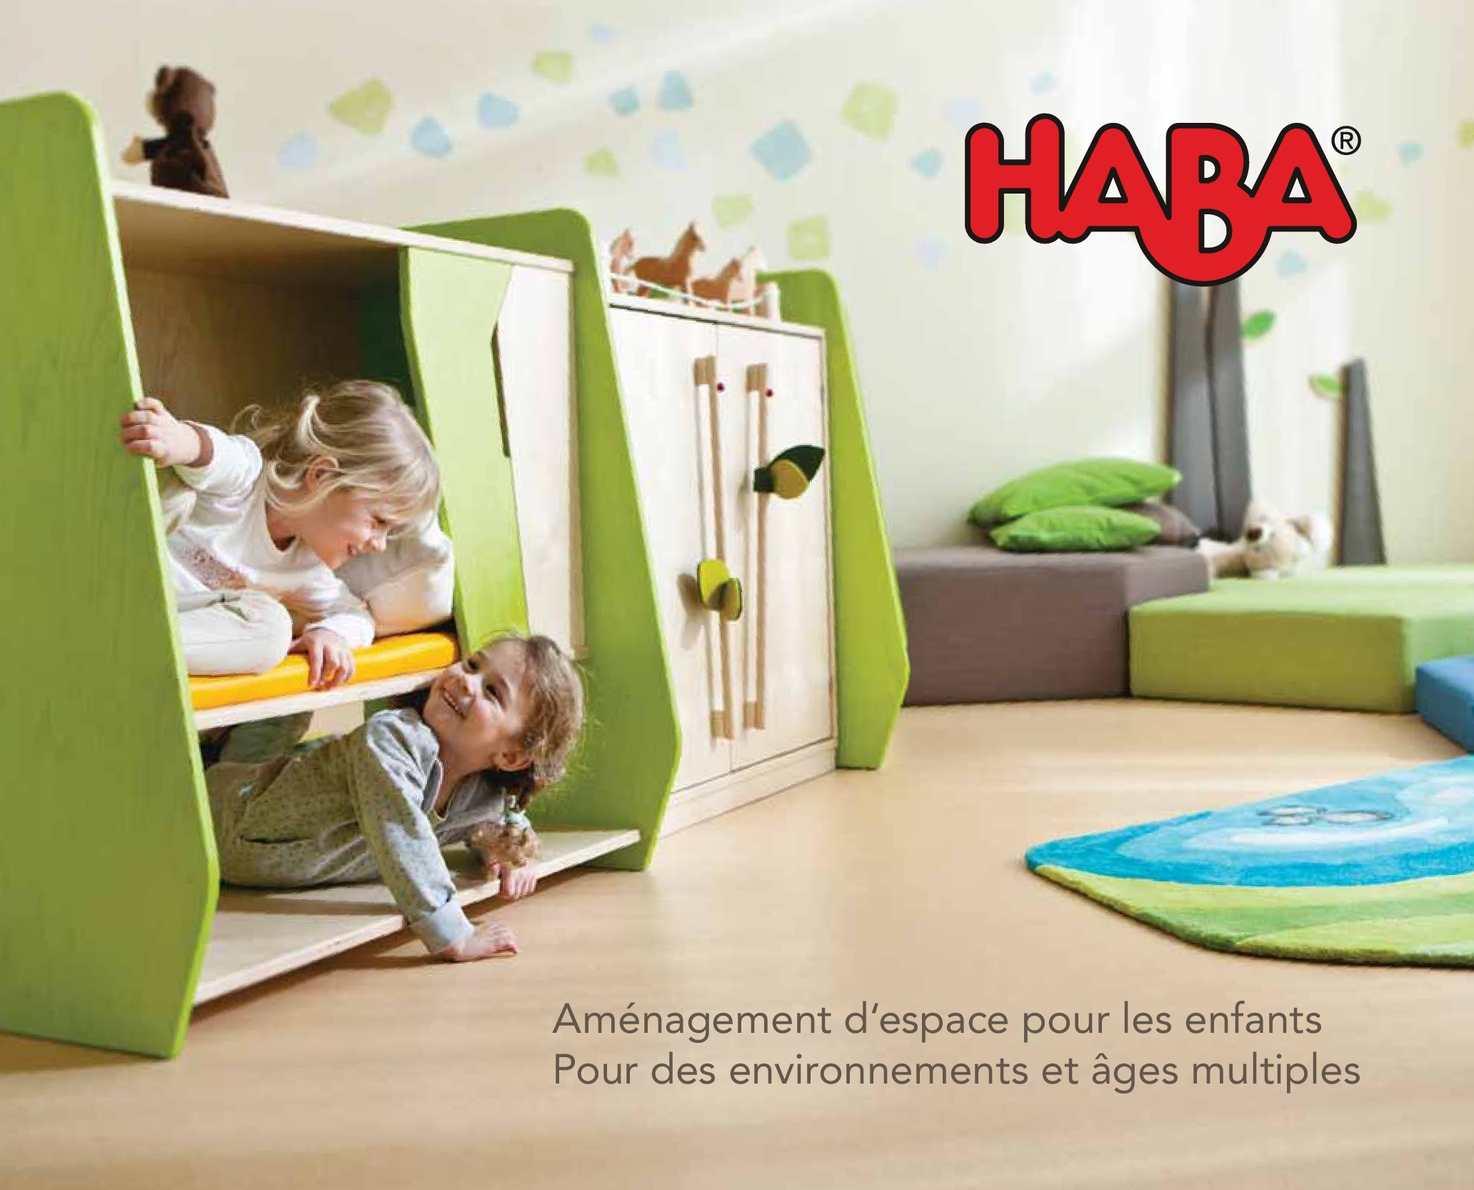 calam o haba le savoir faire en espace collectif fr 2014. Black Bedroom Furniture Sets. Home Design Ideas